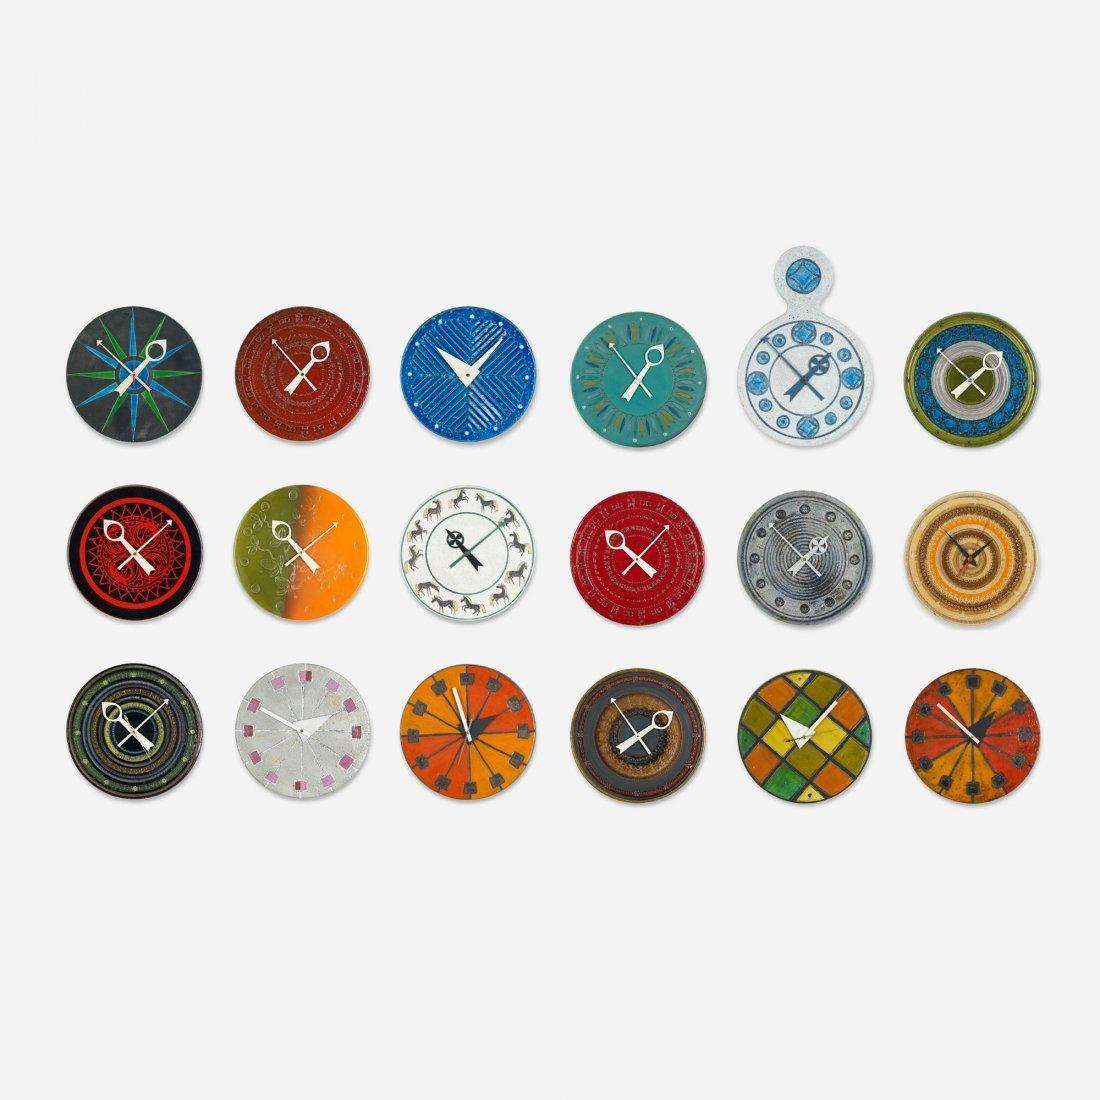 110: Nelson & Associates Meridian clocks (set of 18)